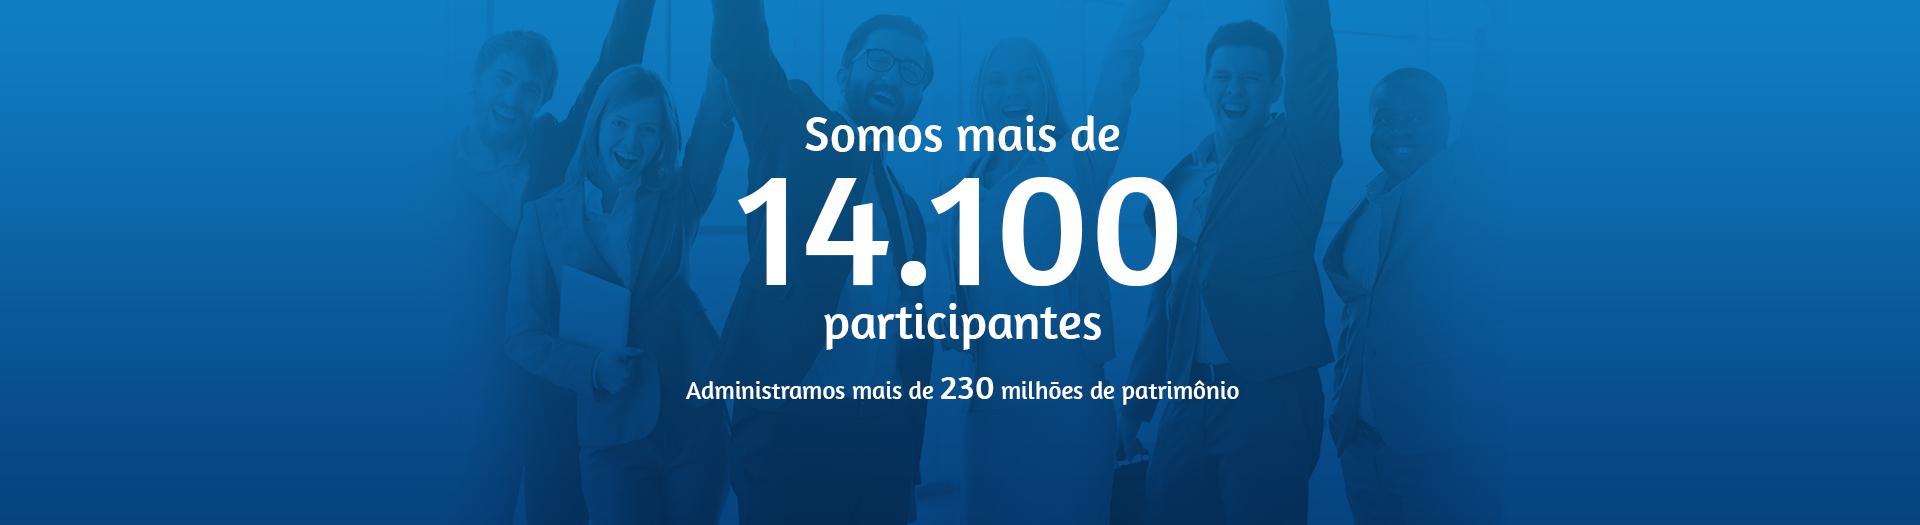 Funpresp_Site_Banner_n-de-participantes_patrocinador-1